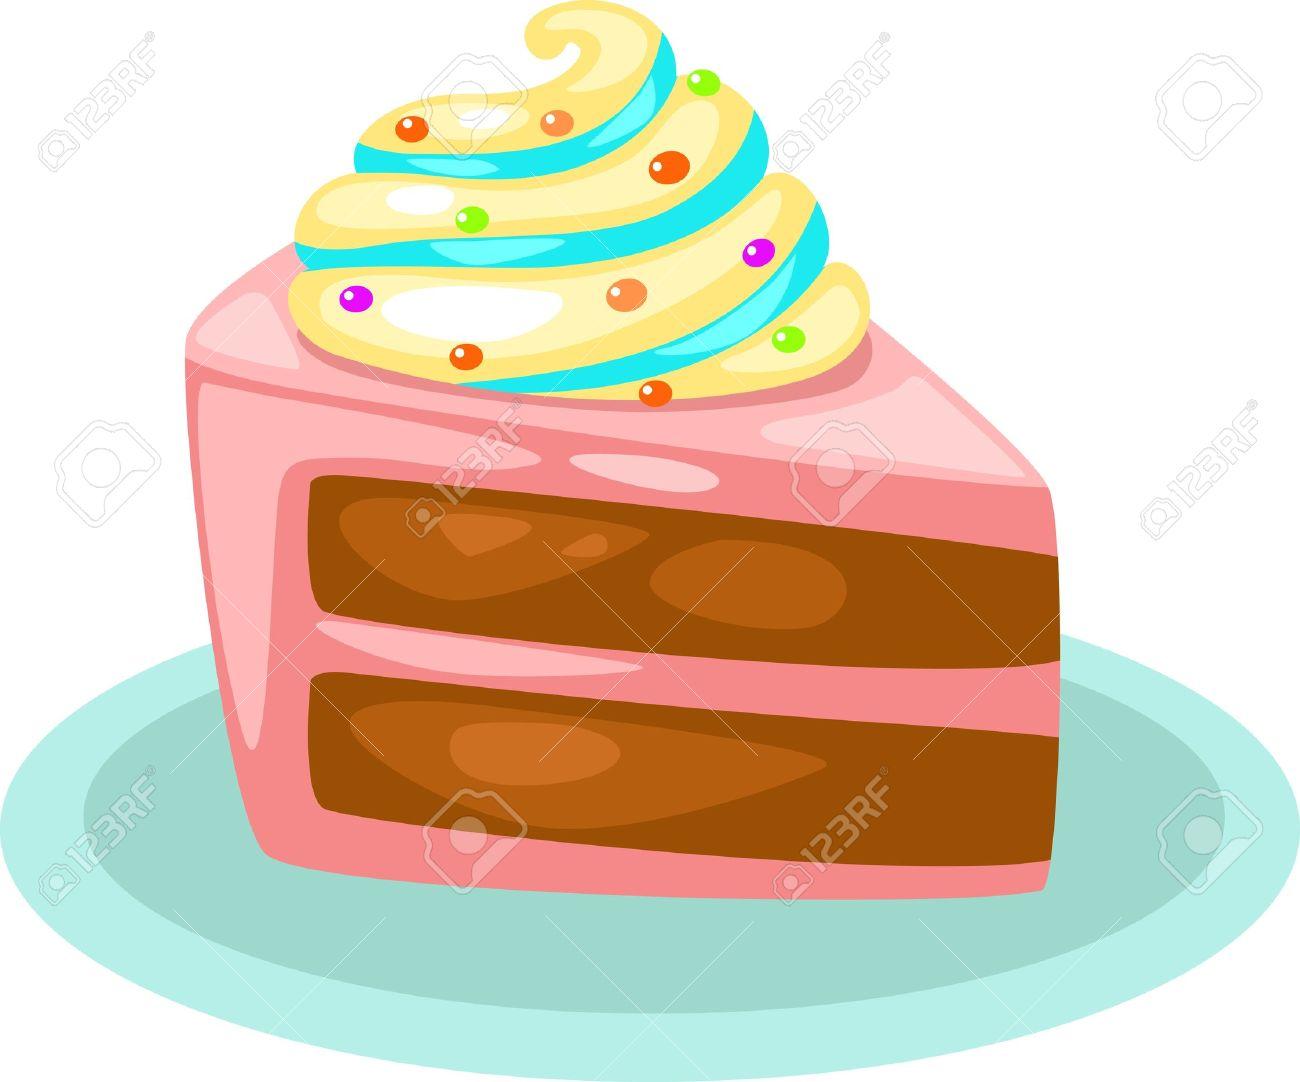 1300x1082 Dessert Clipart Birthday Cake Slice